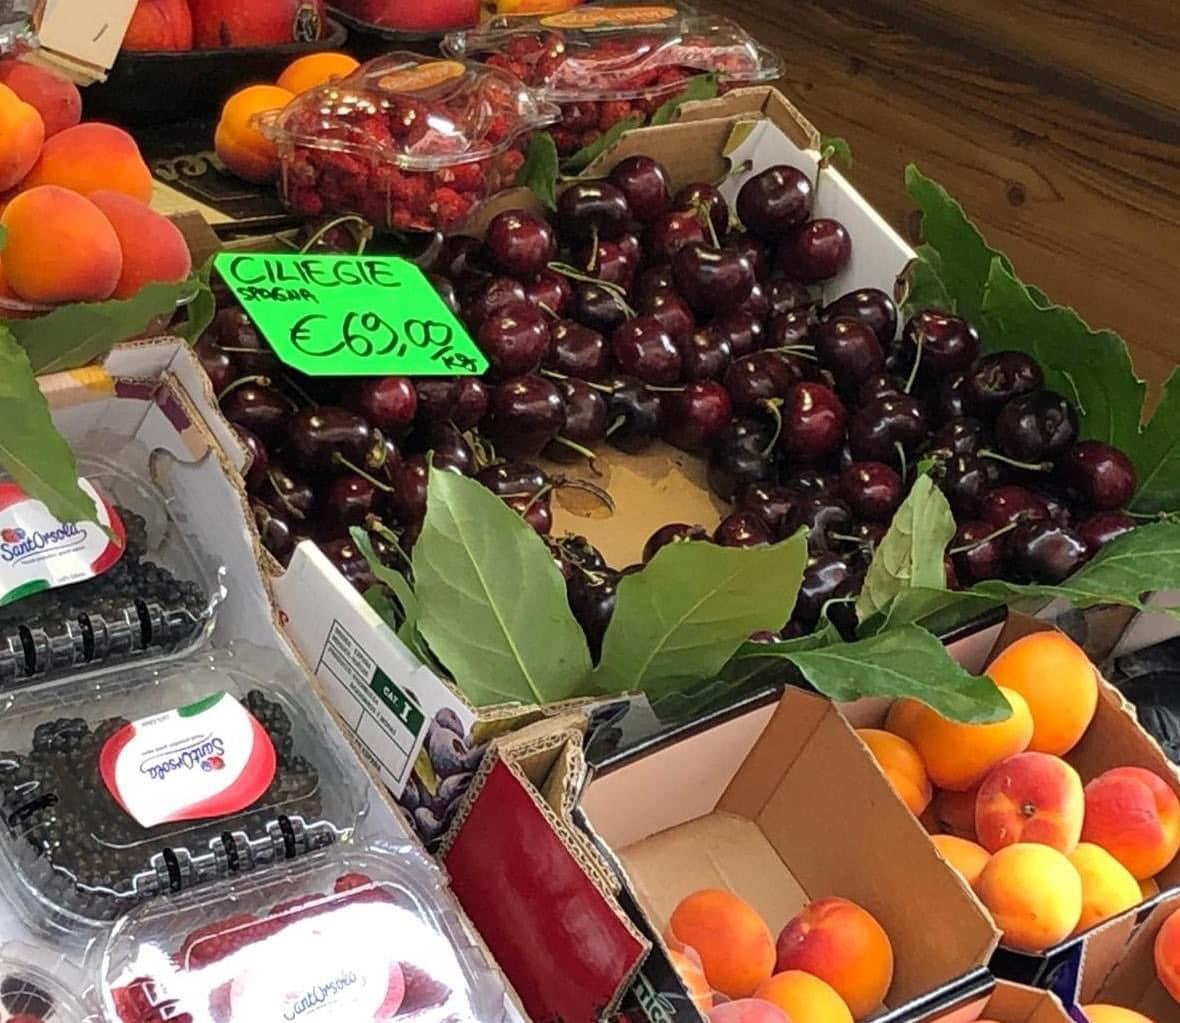 ciliege spagnole 69 euro kg